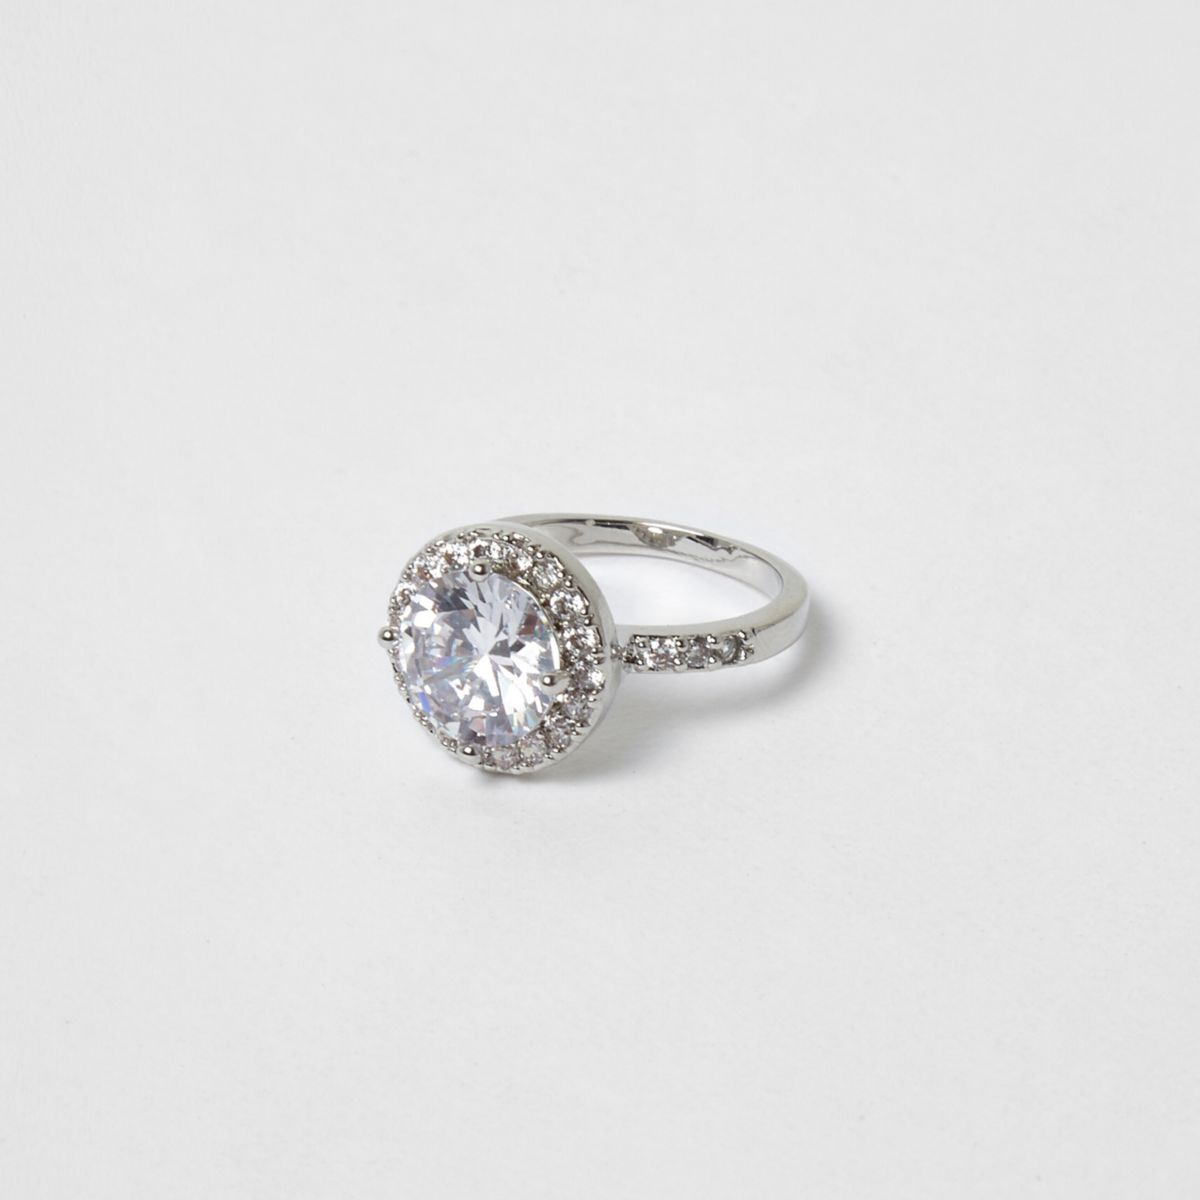 Silver tone diamante ring